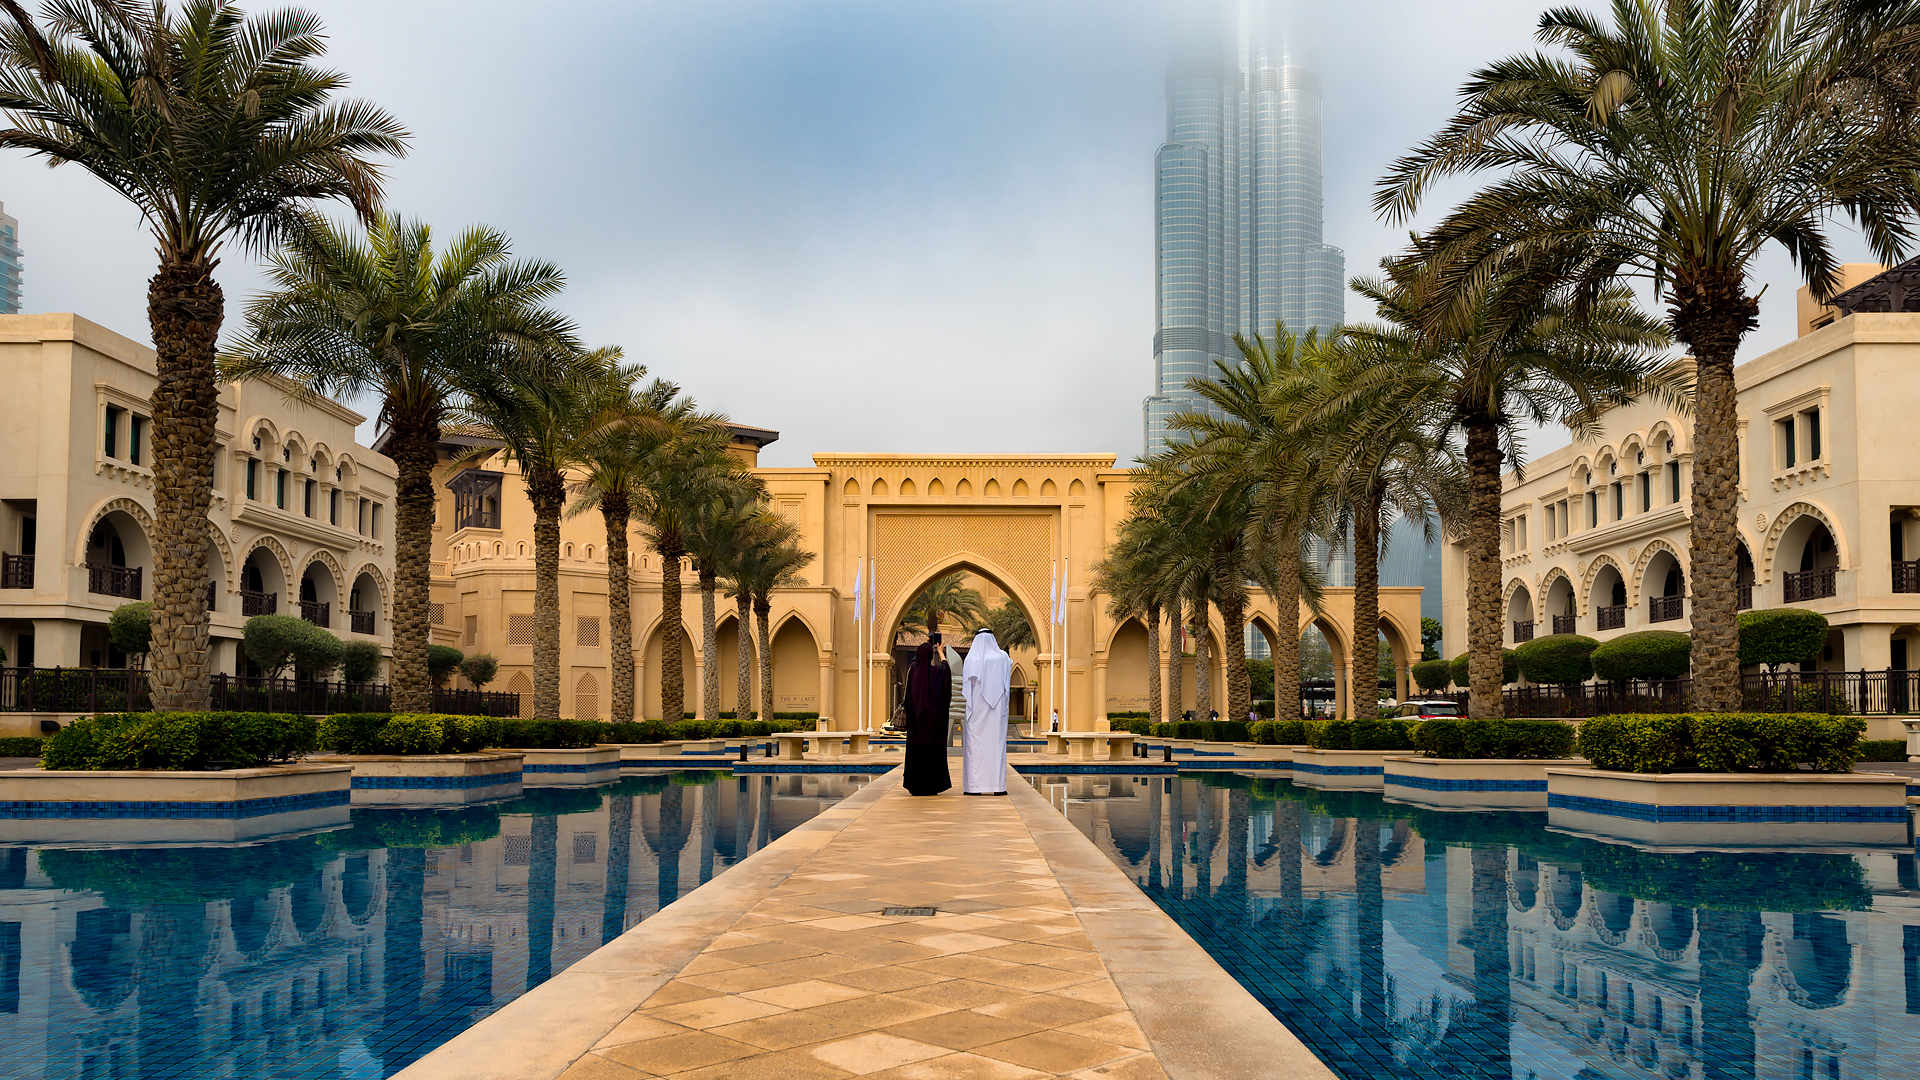 The Palace, Downtown Dubai